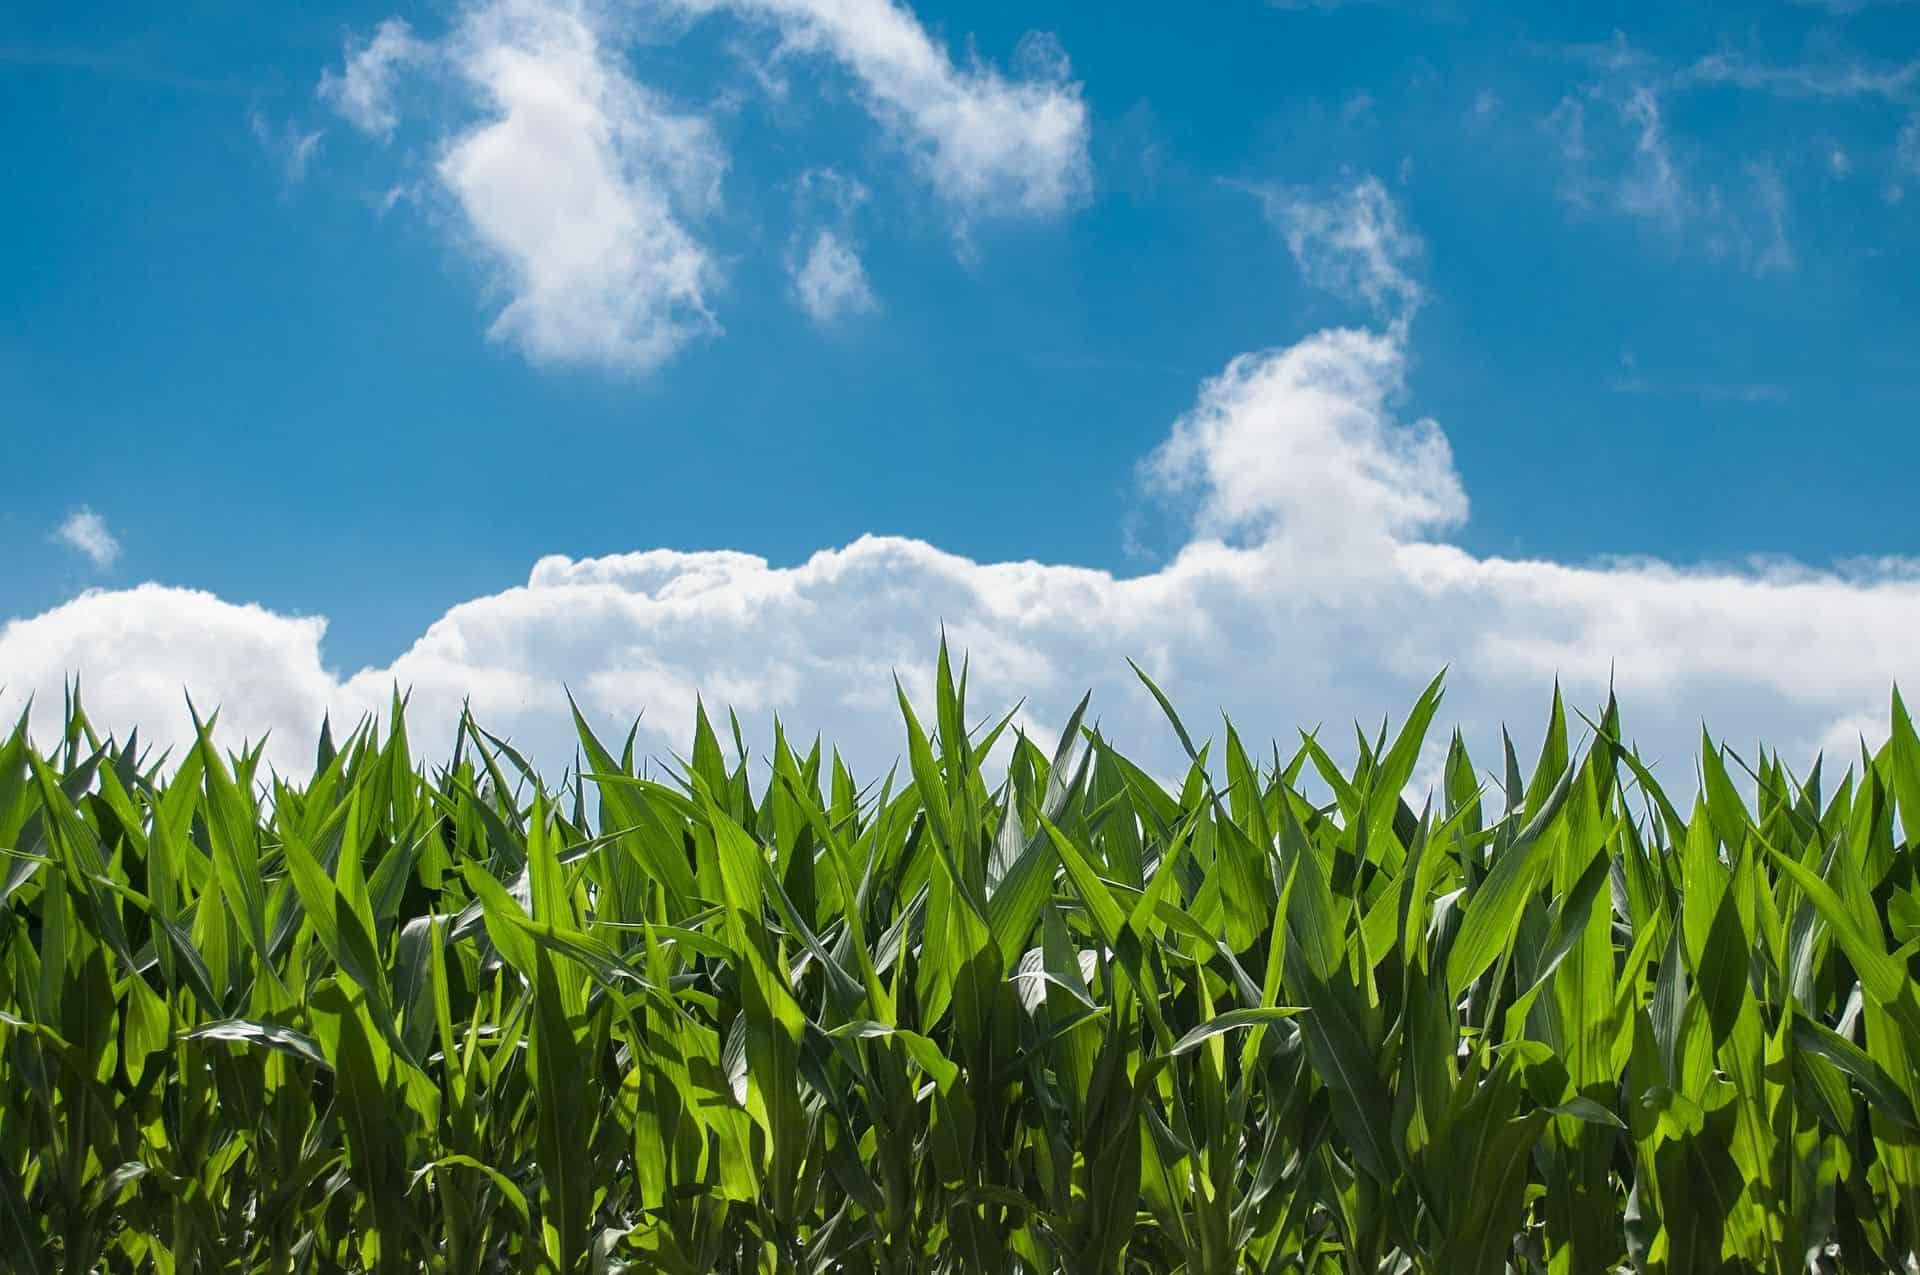 corn field 440338 1920 compressed